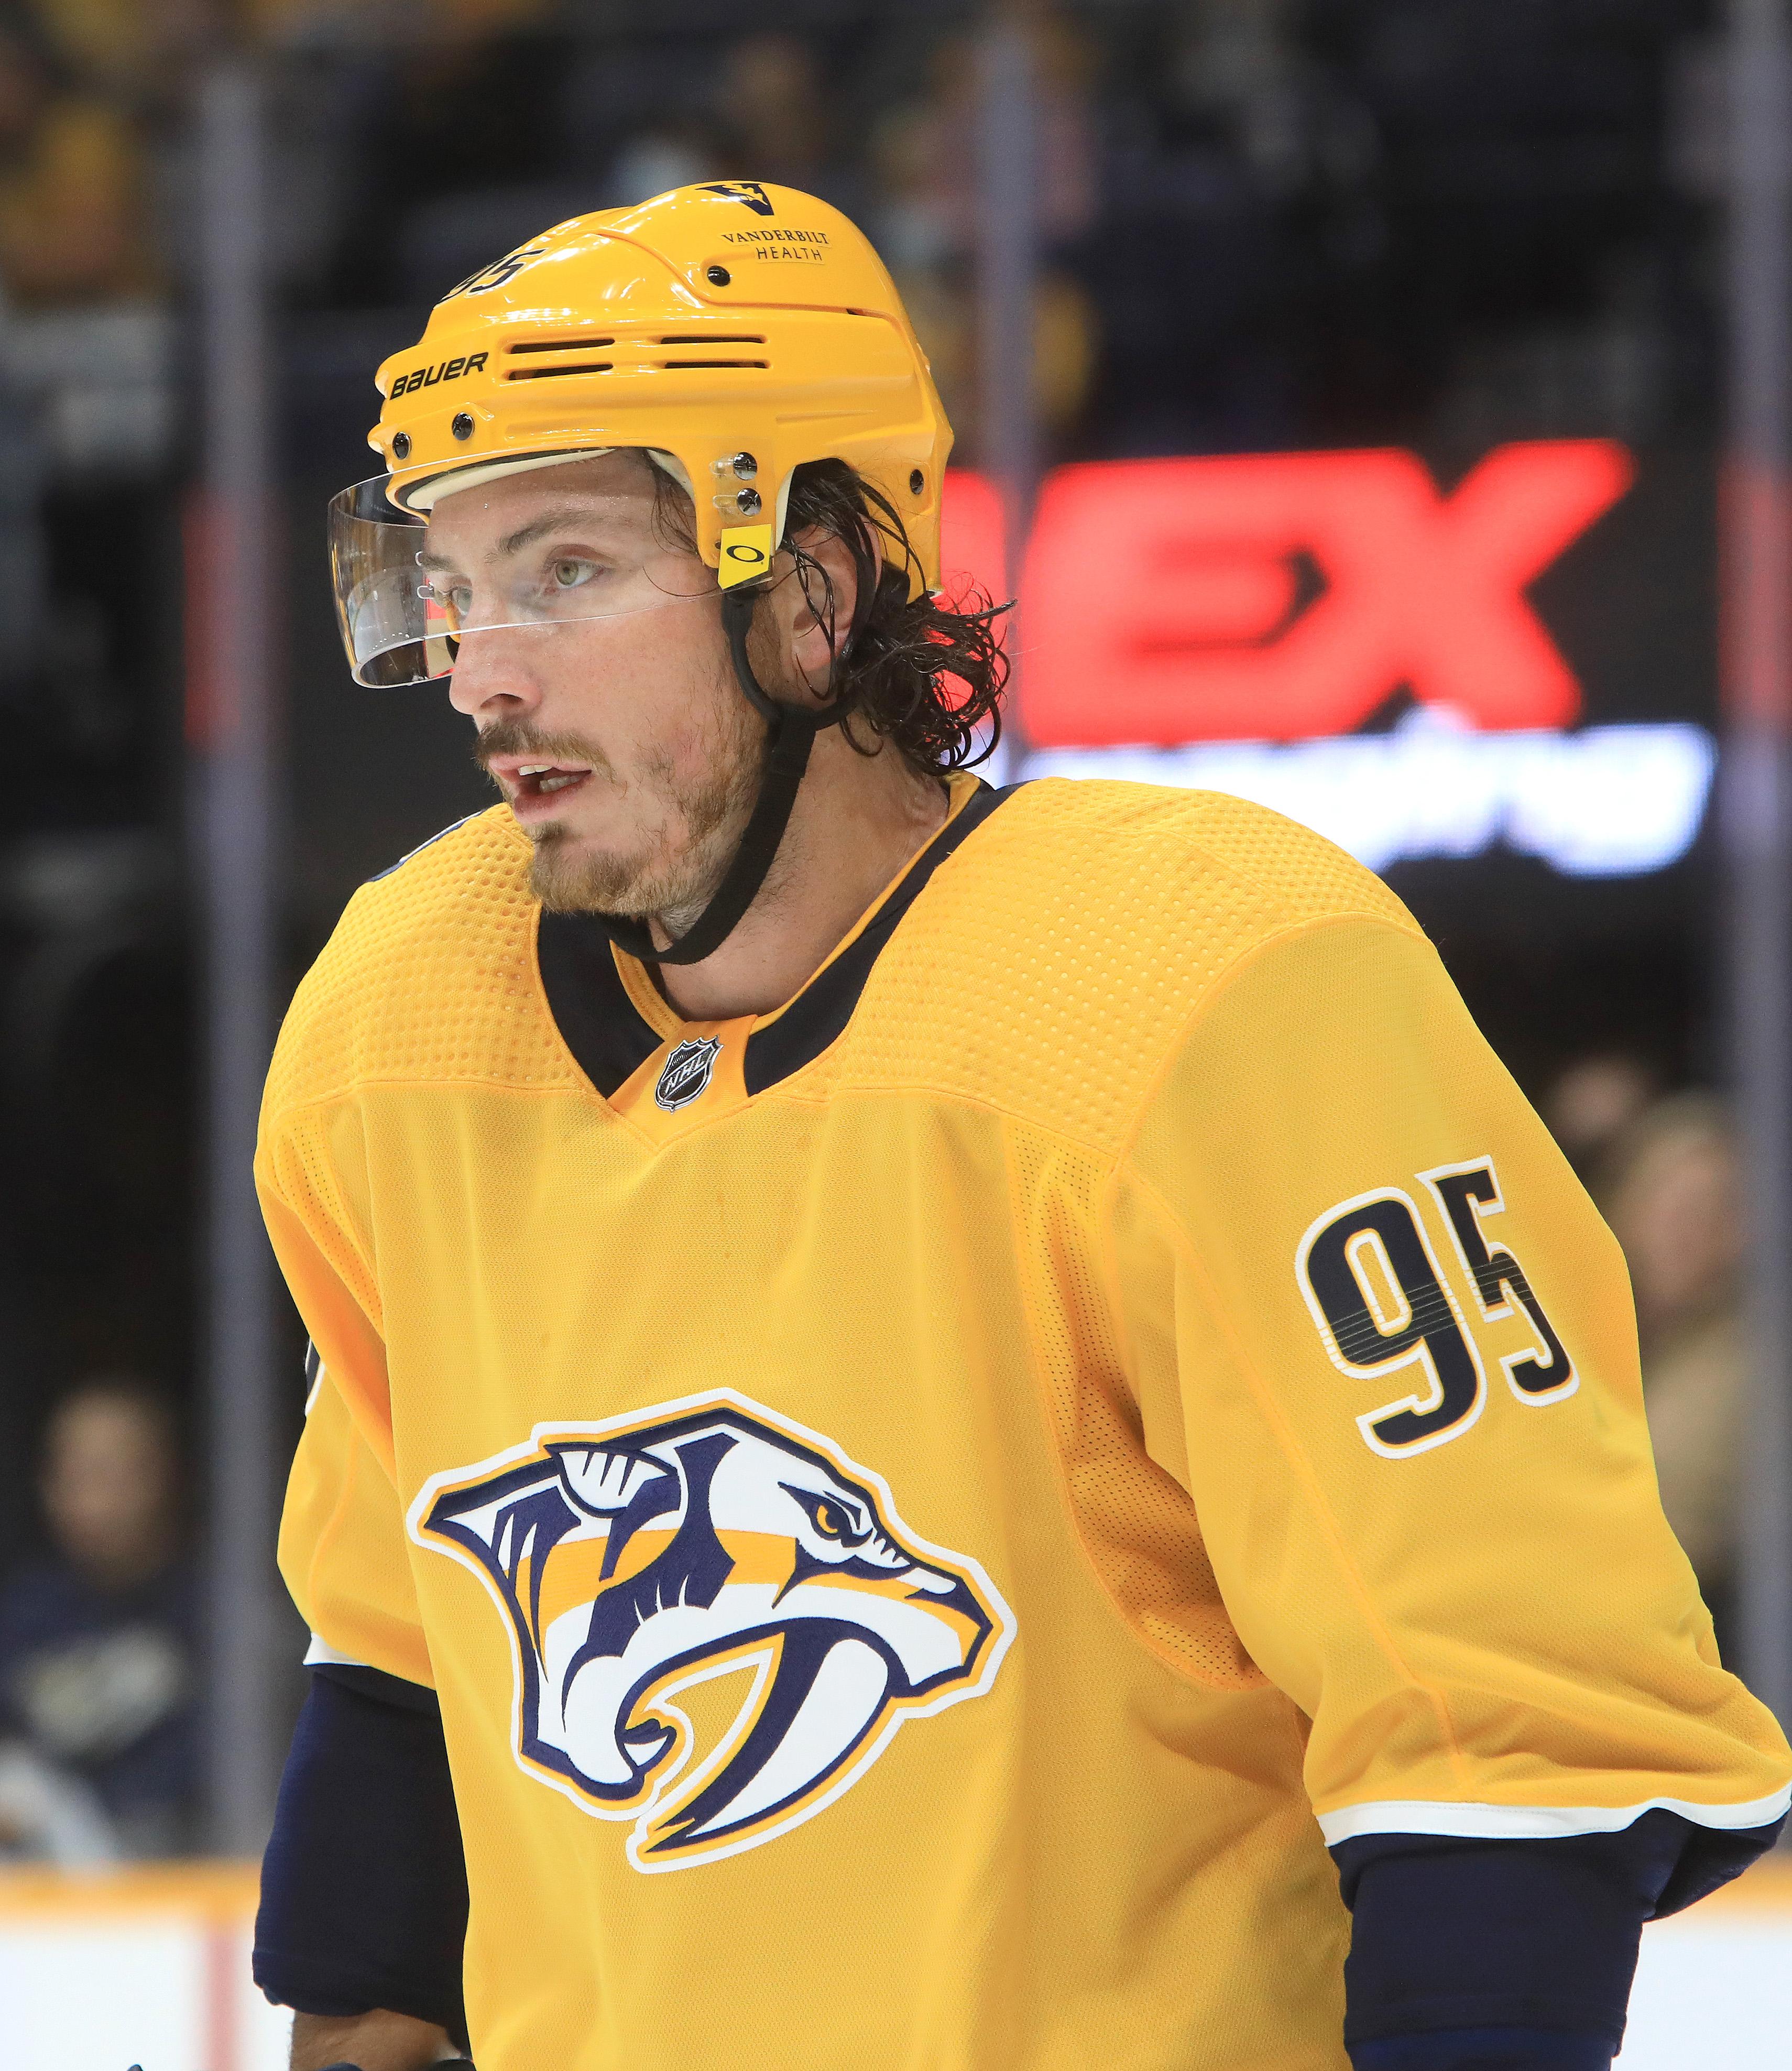 NHL: OCT 16 Hurricanes at Predators